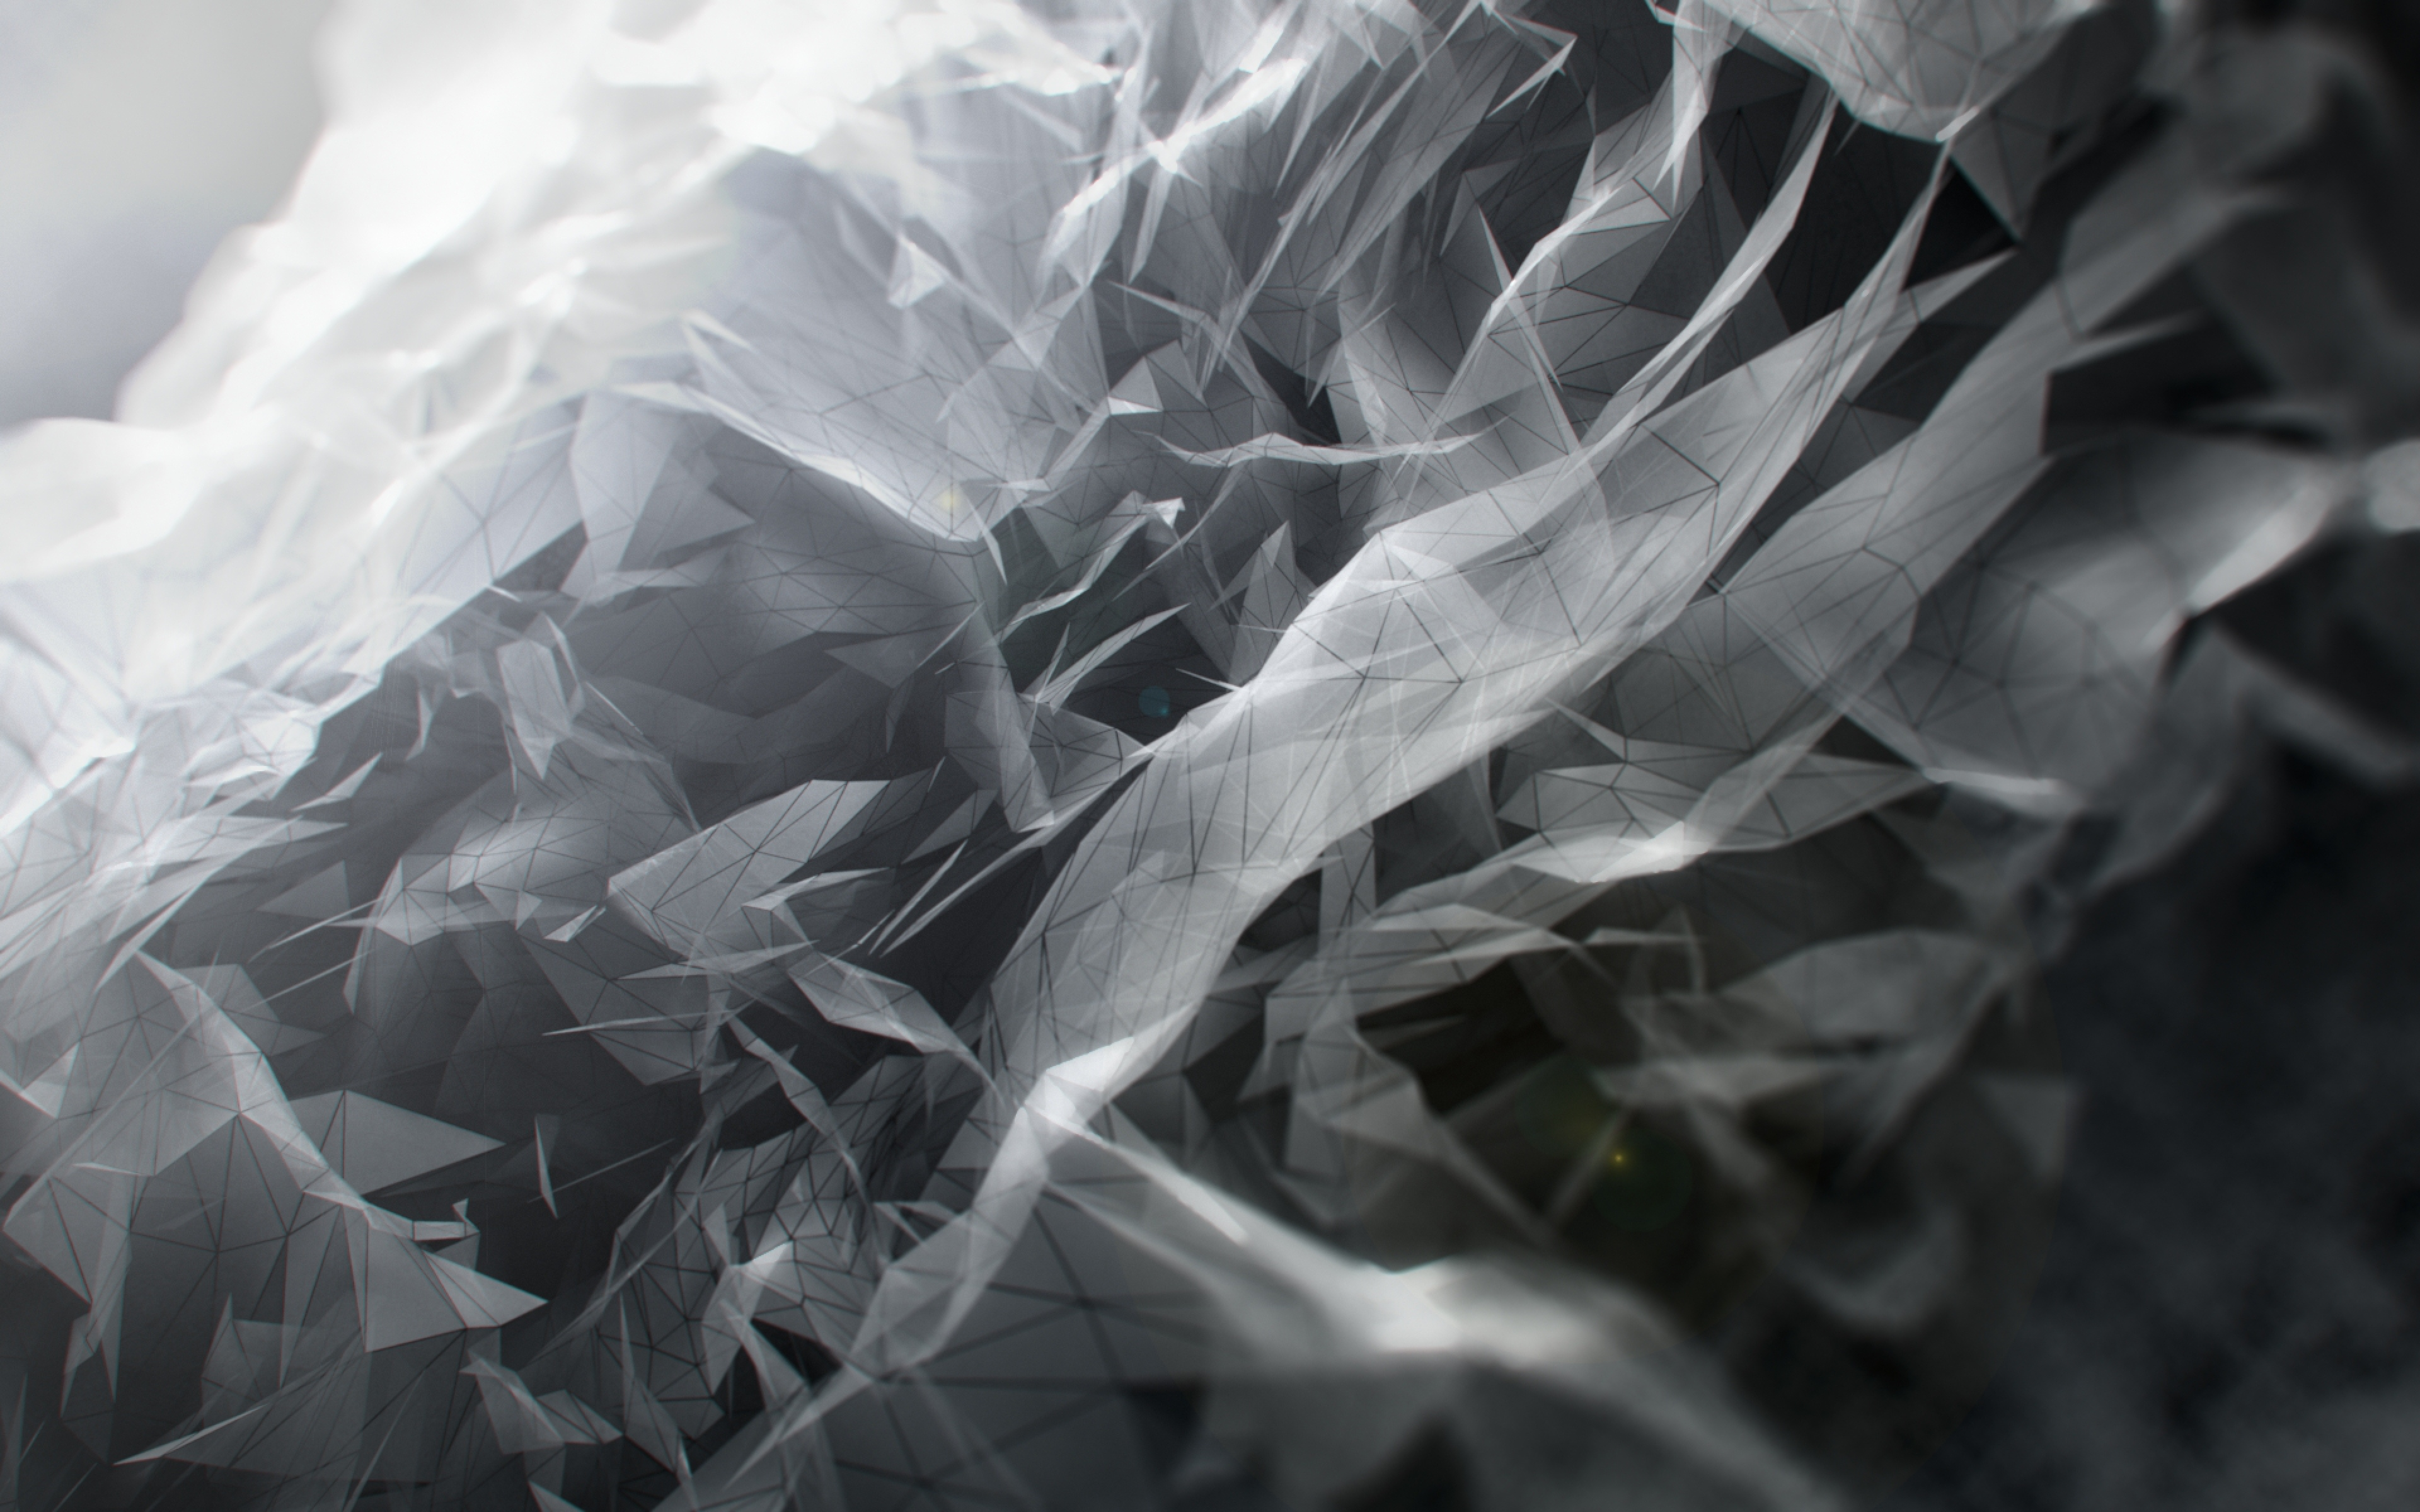 3d Grim Reaper Wallpaper Smoke Backgrounds Free Download Pixelstalk Net